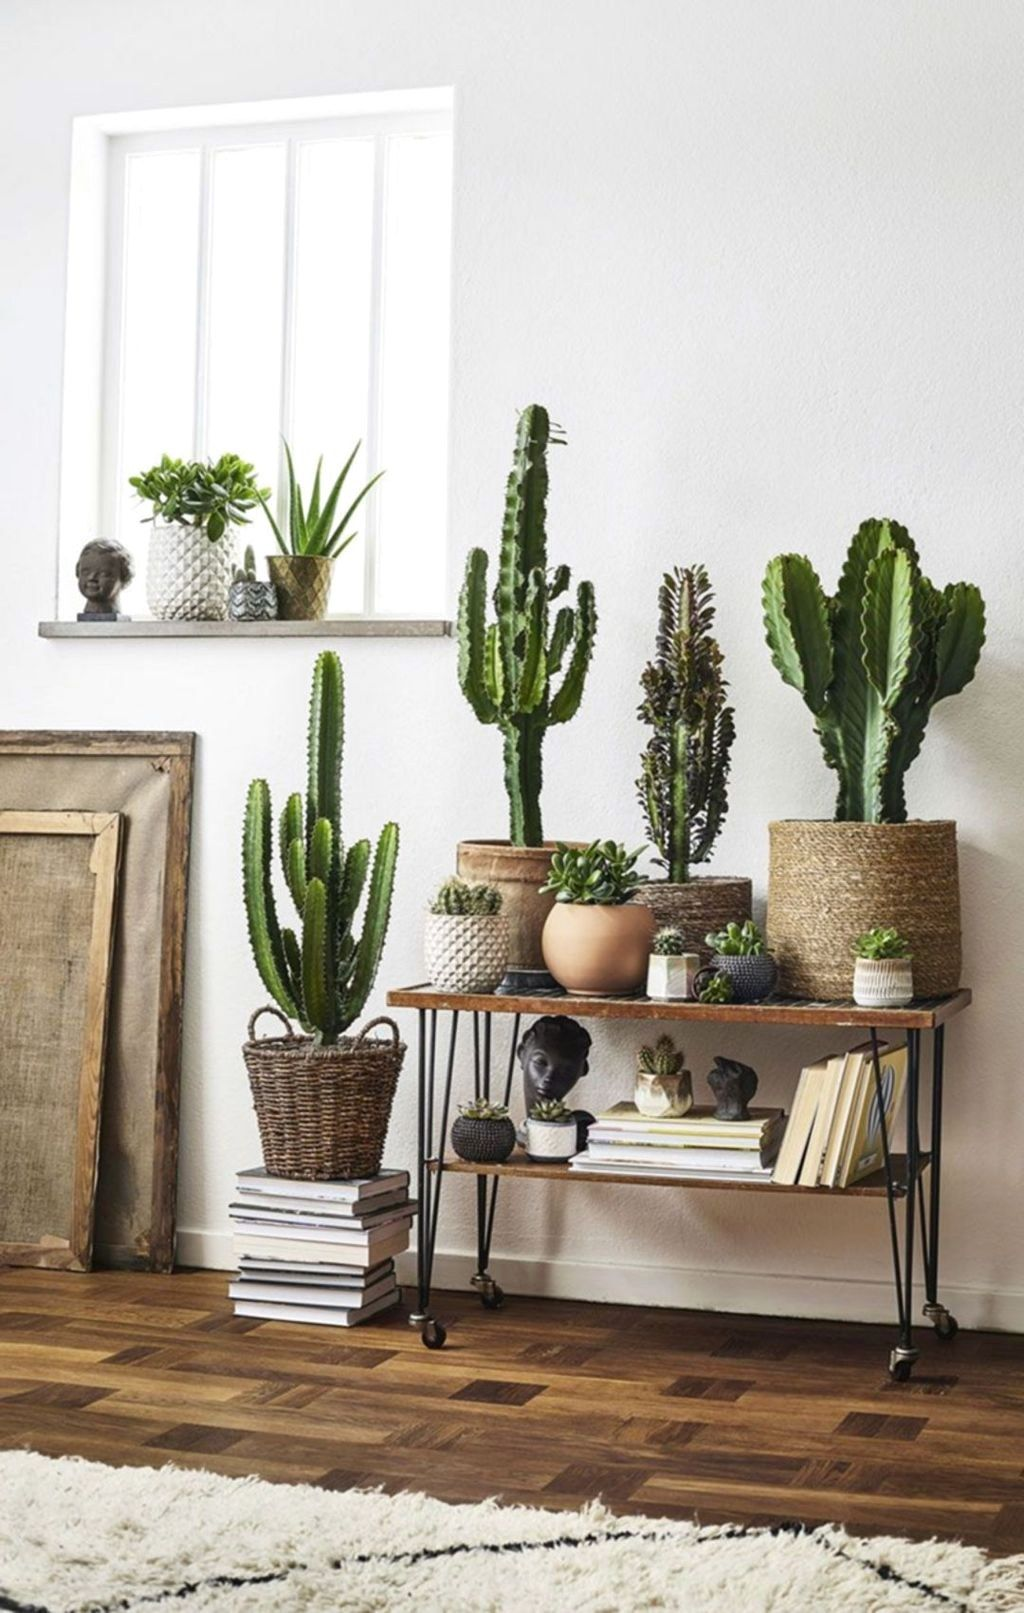 40 Stylish Home Decor Ideas Plant Decor Indoor House Plants Decor Cactus Decor